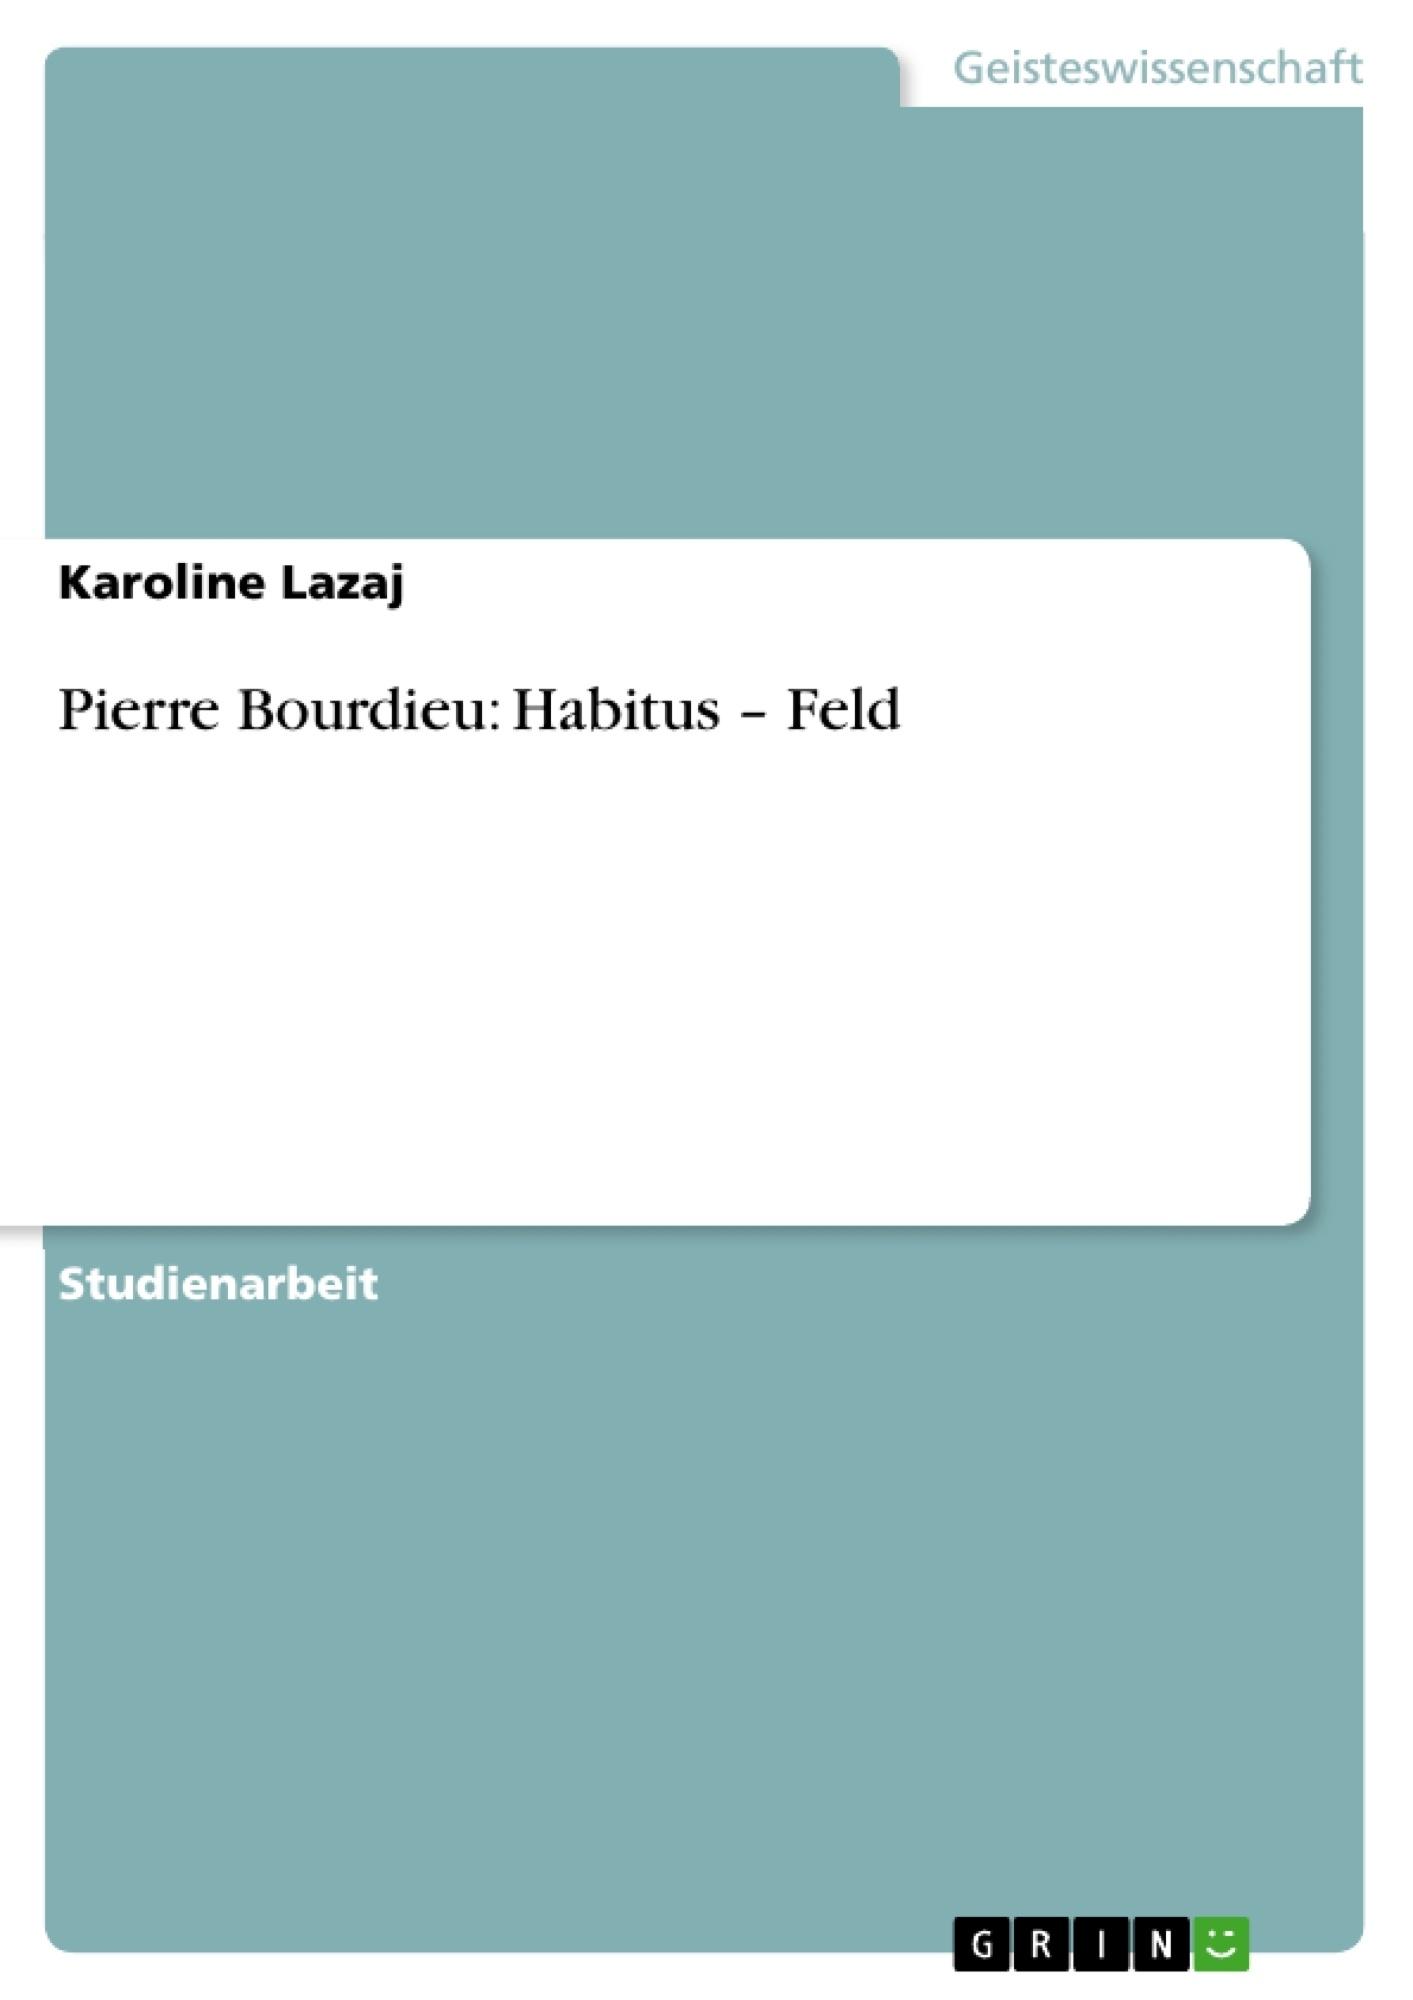 Titel: Pierre Bourdieu: Habitus – Feld